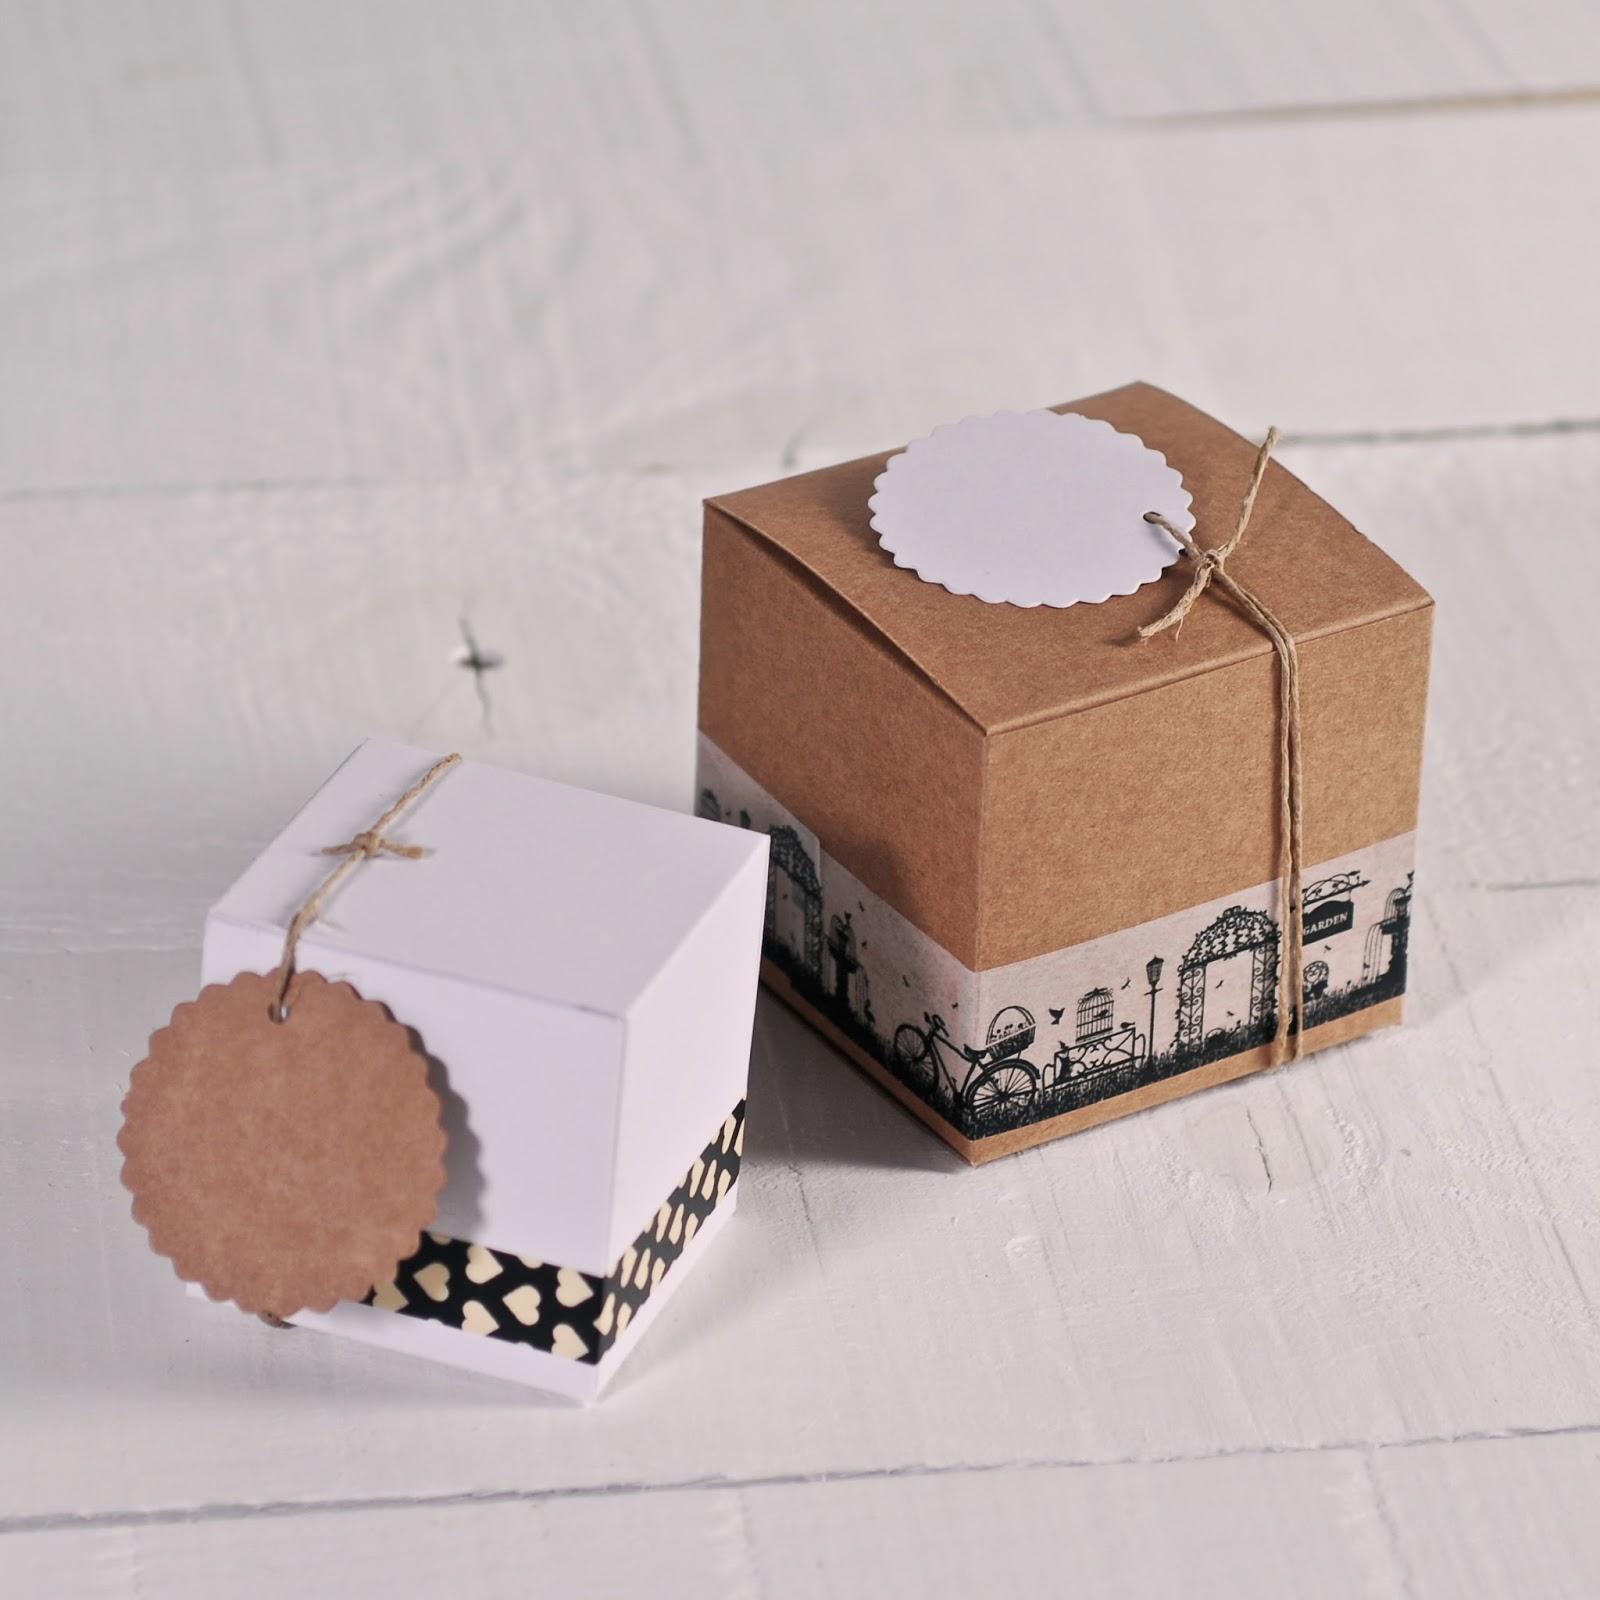 Cajas decoradas de carton para fiestas - Cajas de carton decoradas baratas ...